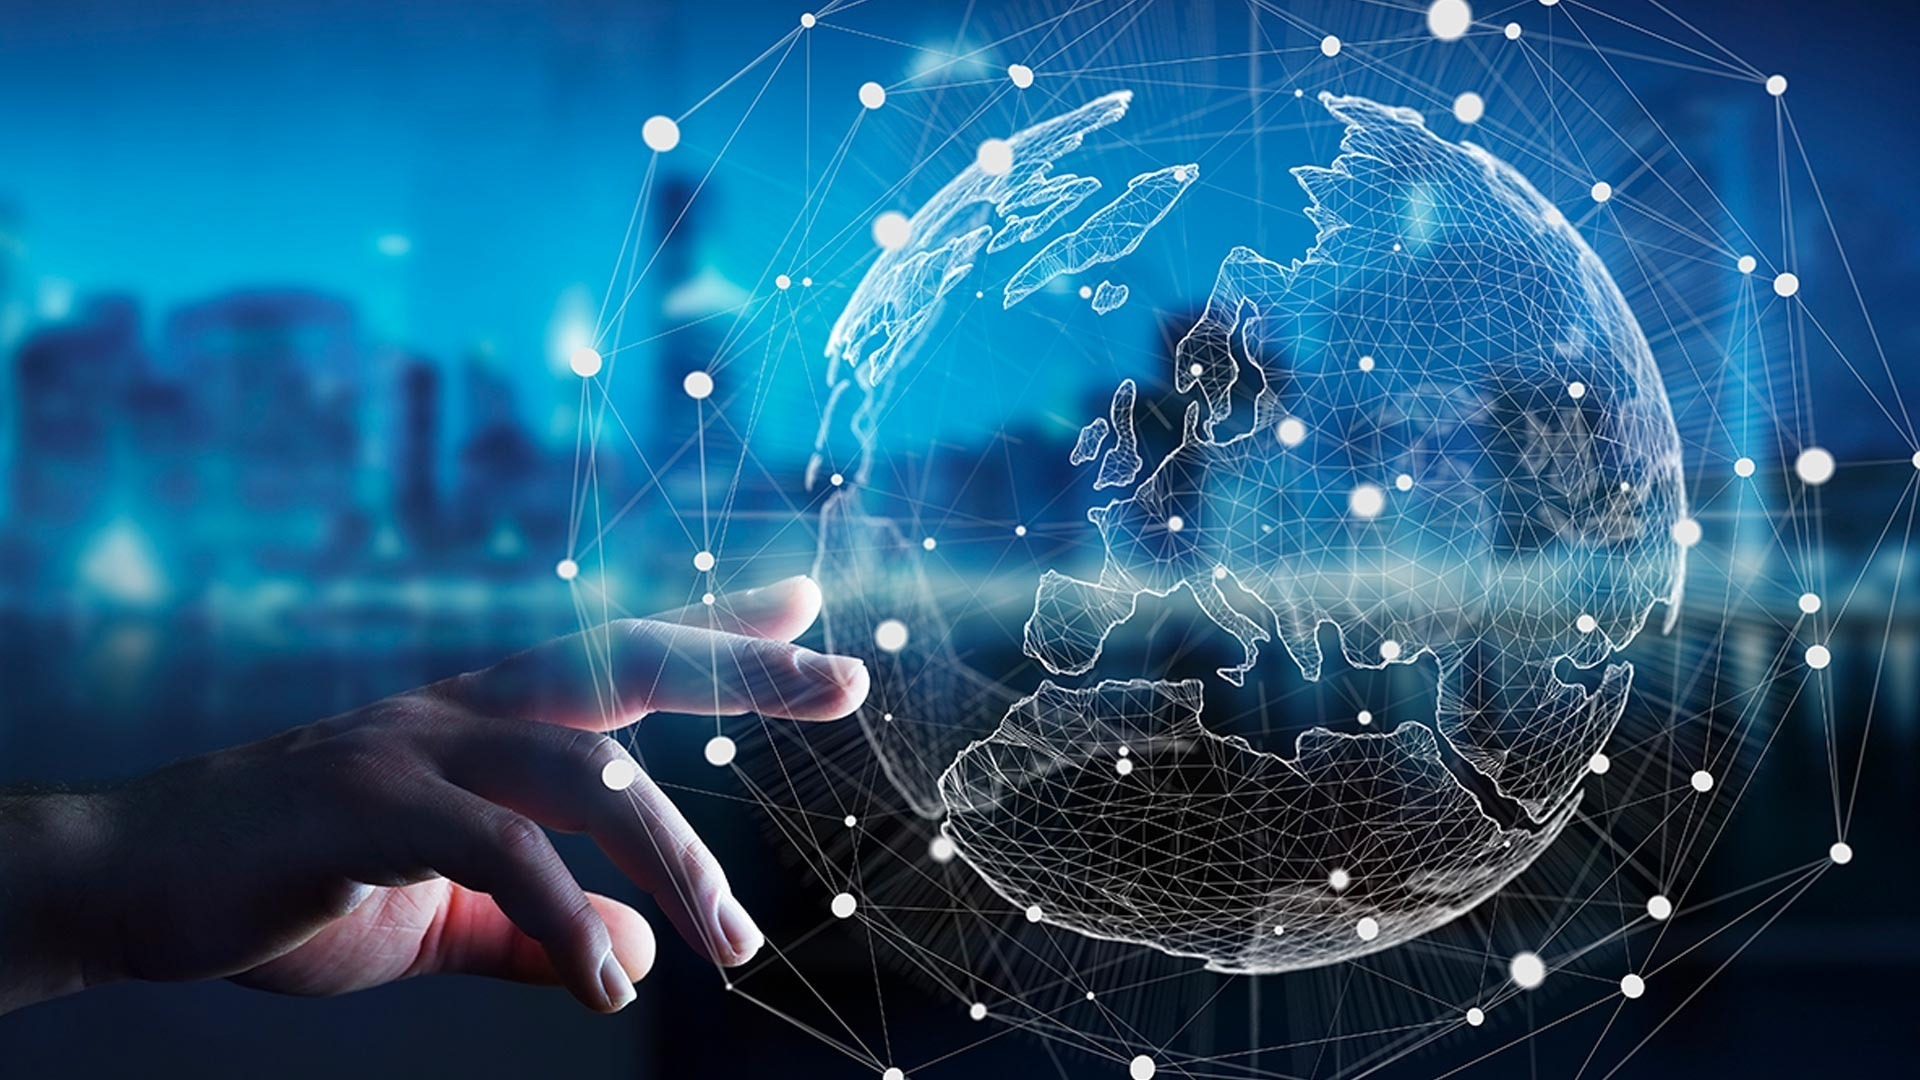 Intelligenza Artificiale: fantascienza o realtà?